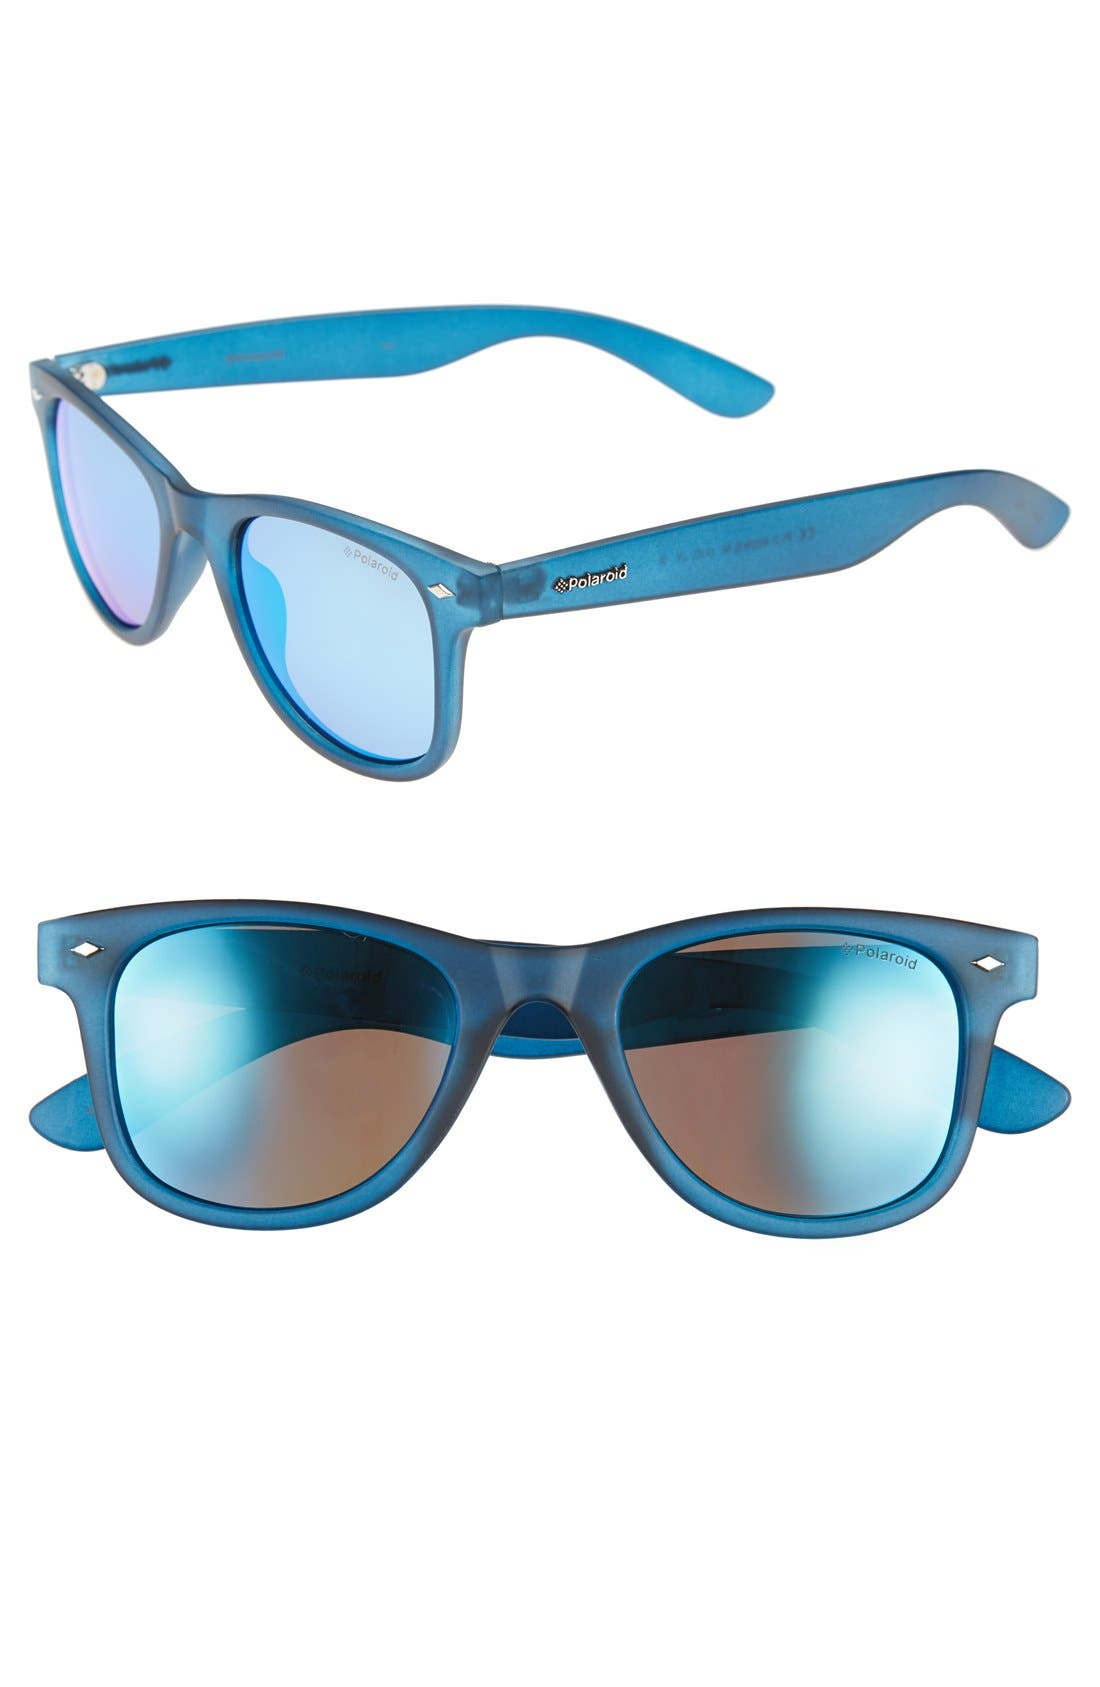 Main Image - Polaroid Eyewear '6009SM' 50mm Polarized Retro Sunglasses